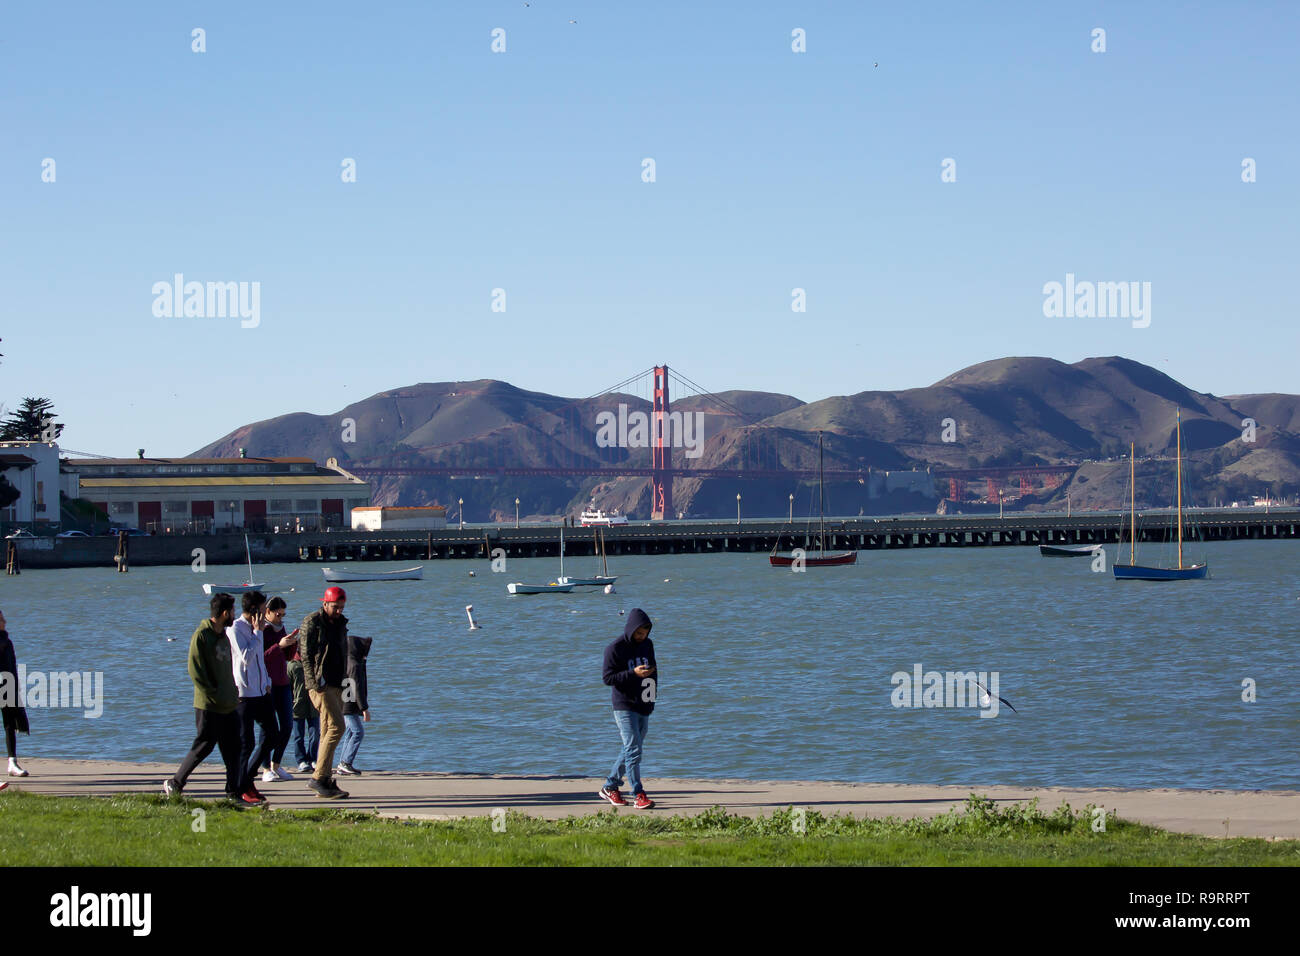 San Francisco, USA. 27th Dec, 2018. Blue Skies over San Francisco. Credit: Keith Larby/Alamy Live News - Stock Image